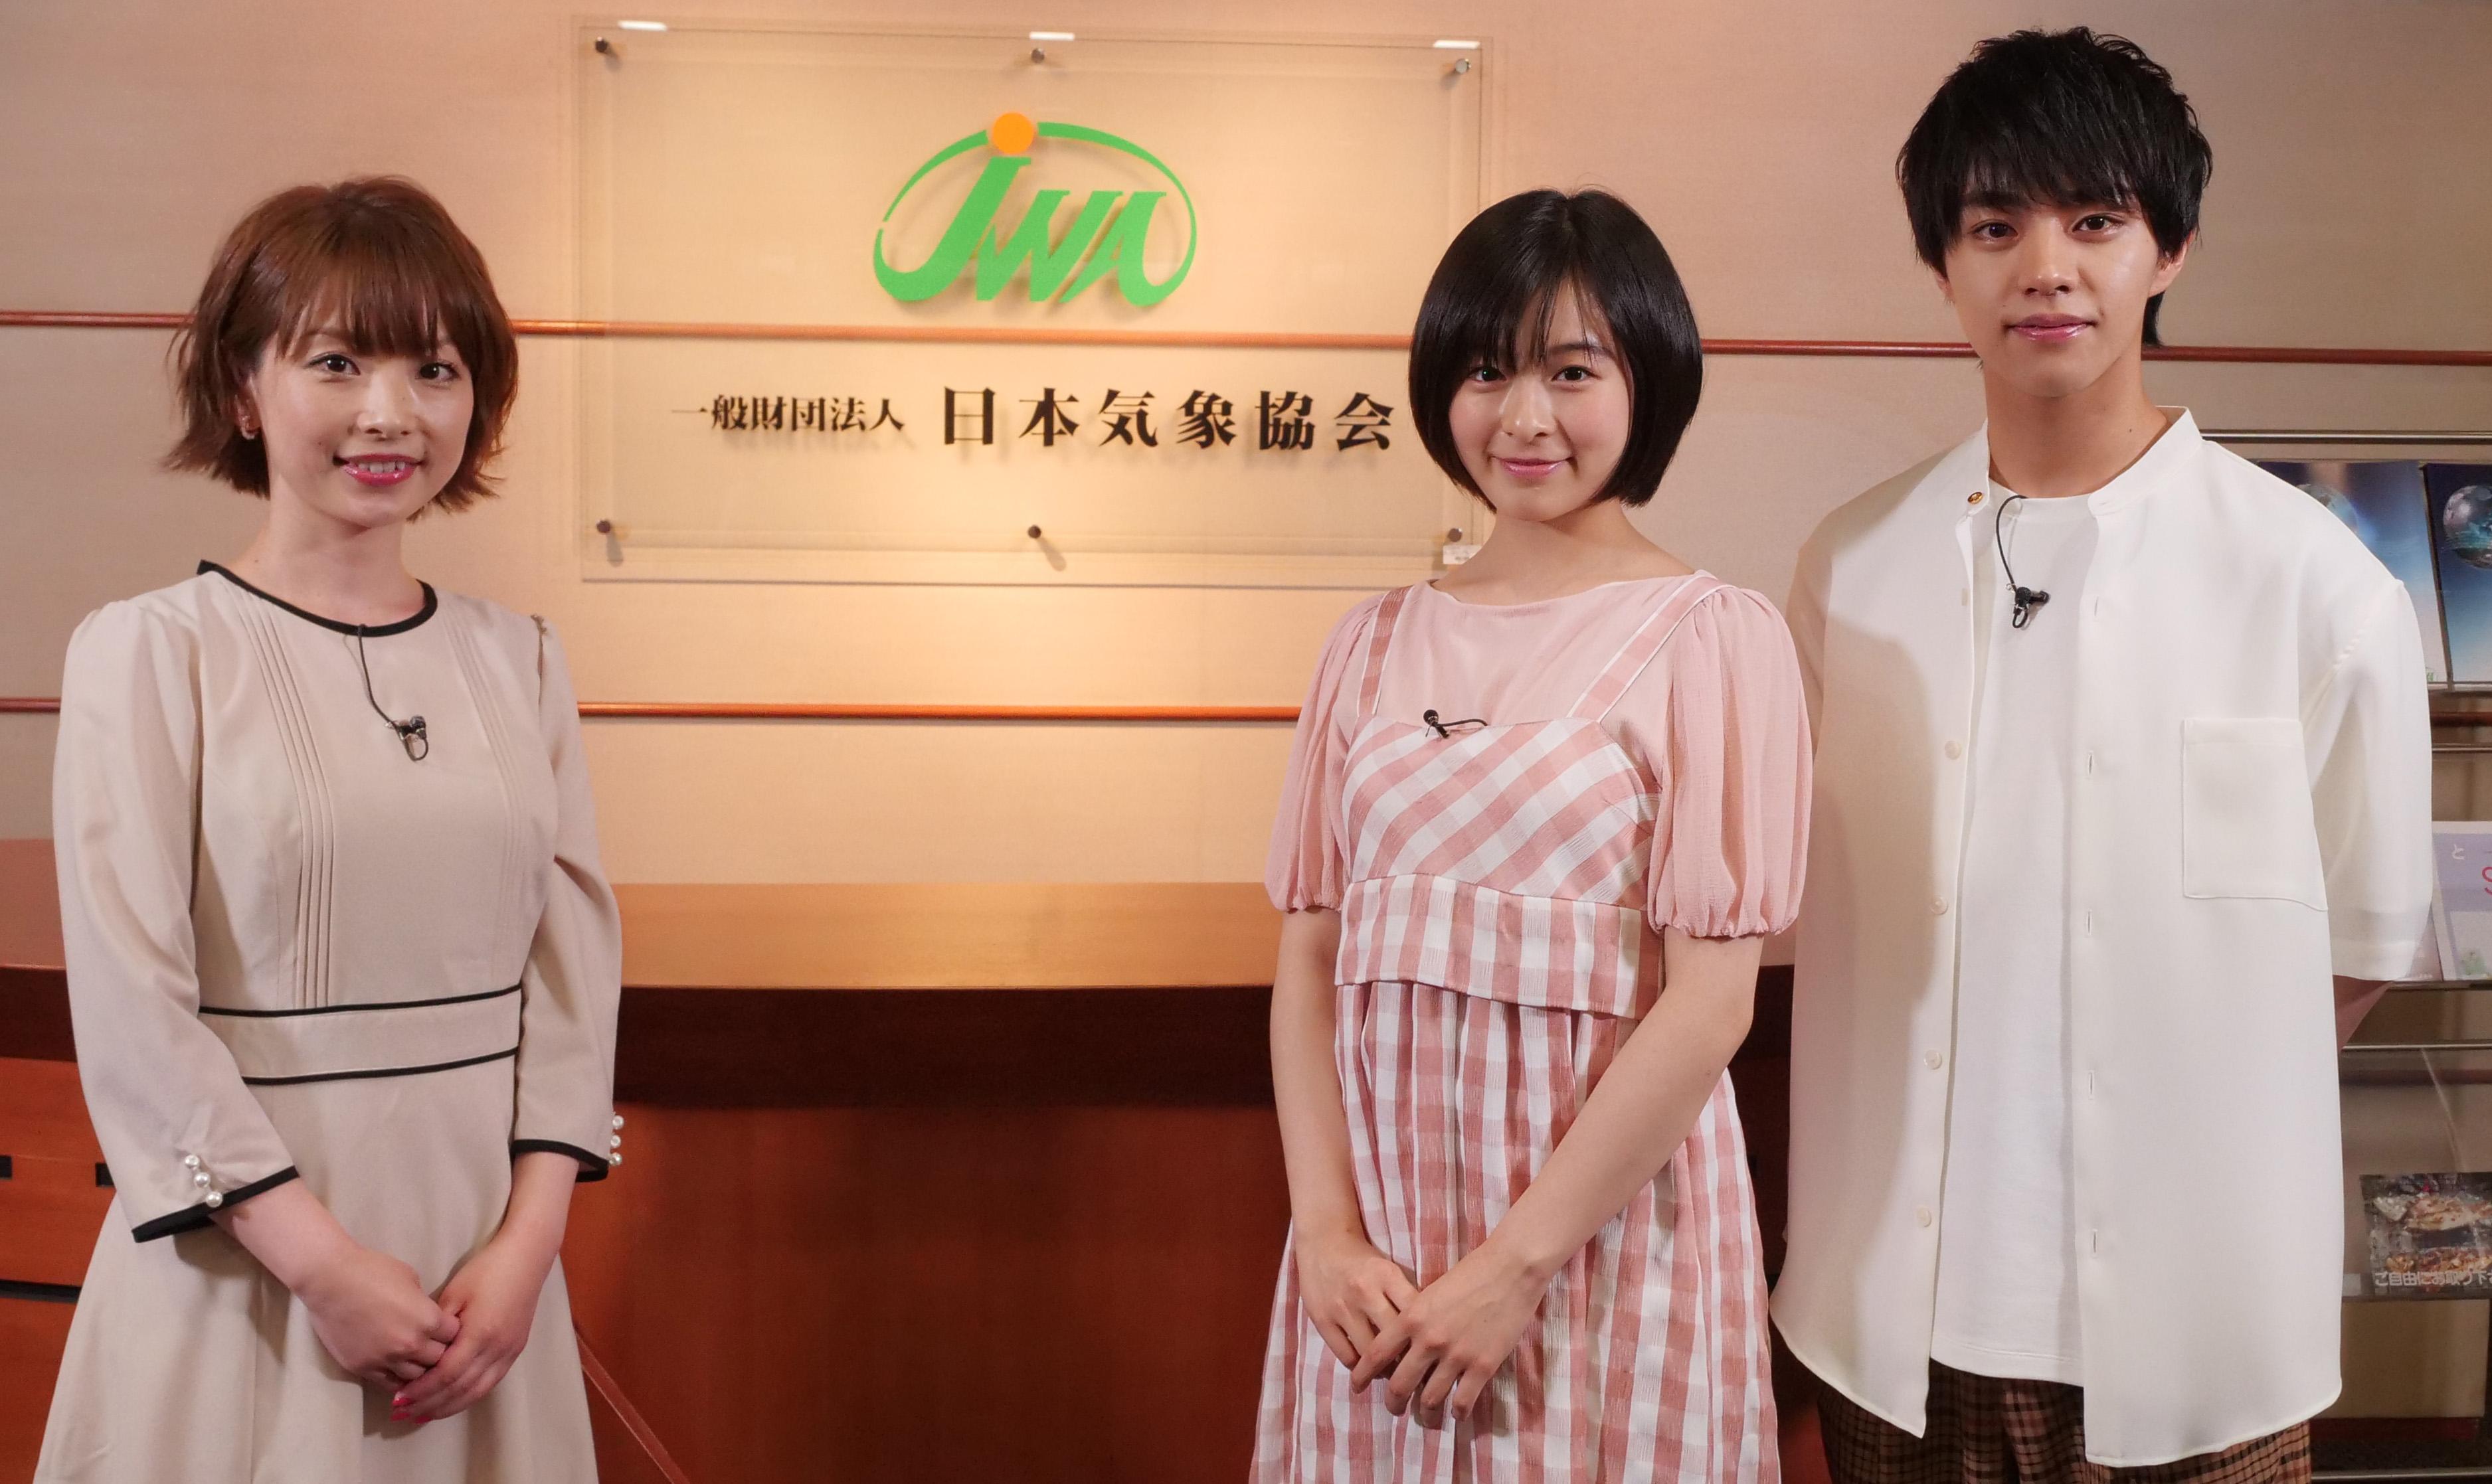 「tenki.jp」サイトで公開する動画コンテンツイメージ